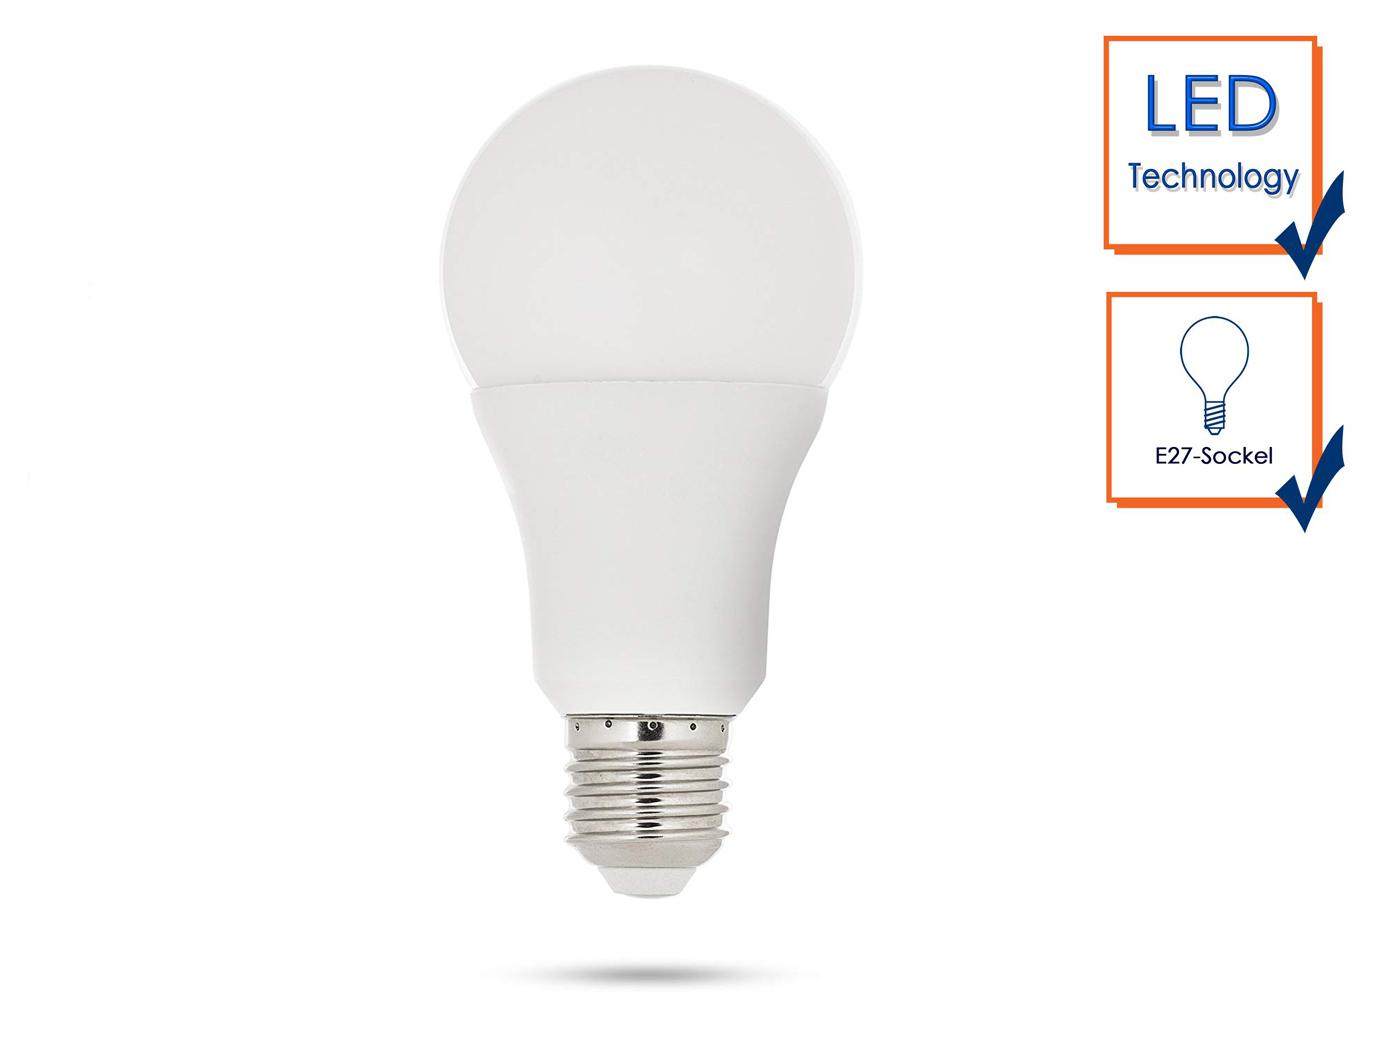 Glühlampe fernbedienbar LED E27 Leuchtmittel 7 Watt für Smarthome Basic Serie